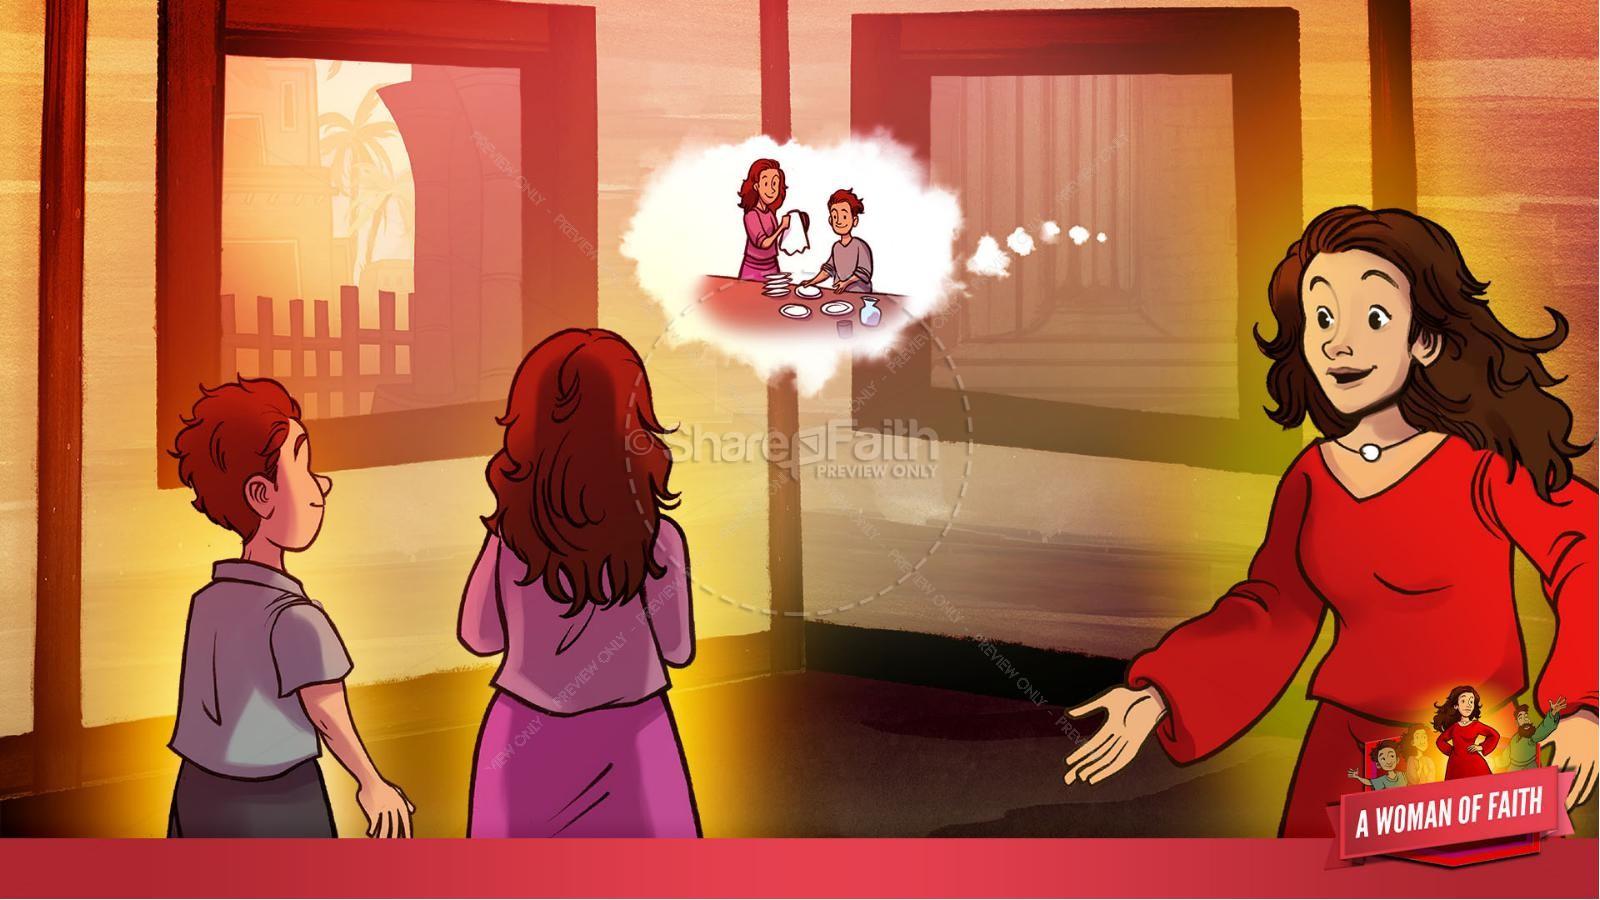 Proverbs 31 A Woman of Faith Kids Bible Story | slide 30